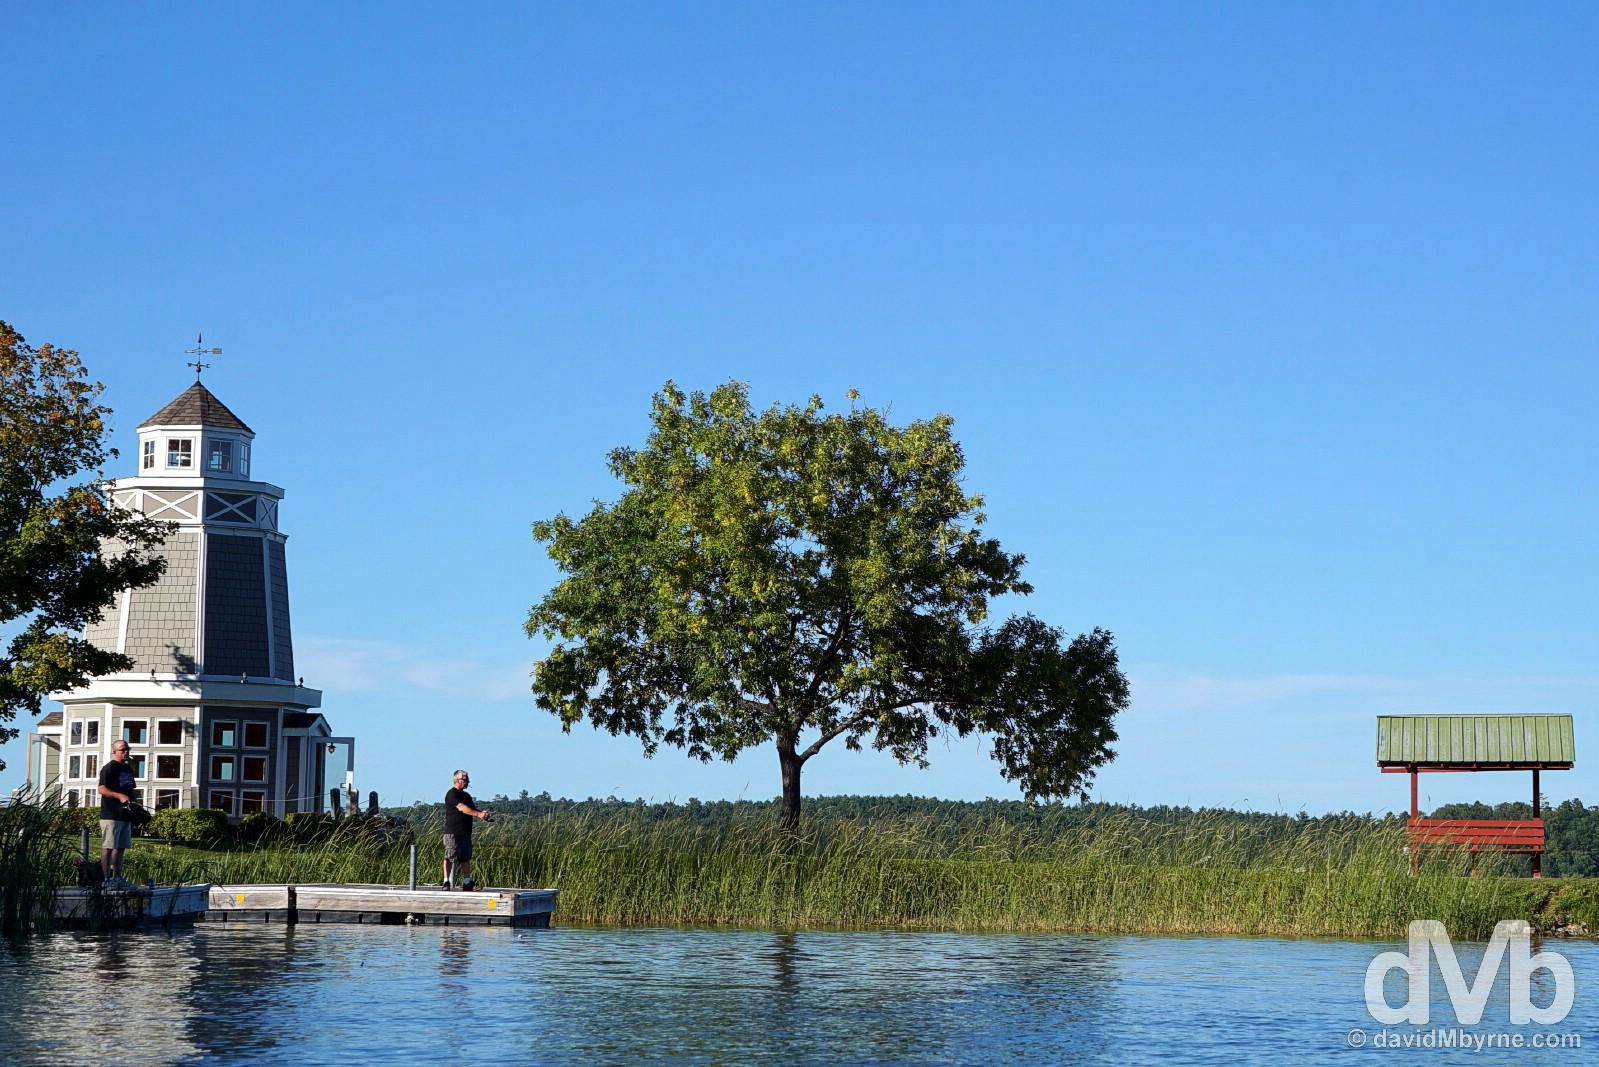 Fishing in Walker City Park on the edge of Leech Lake. Walker, northern Minnesota, USA. August 30, 2016.